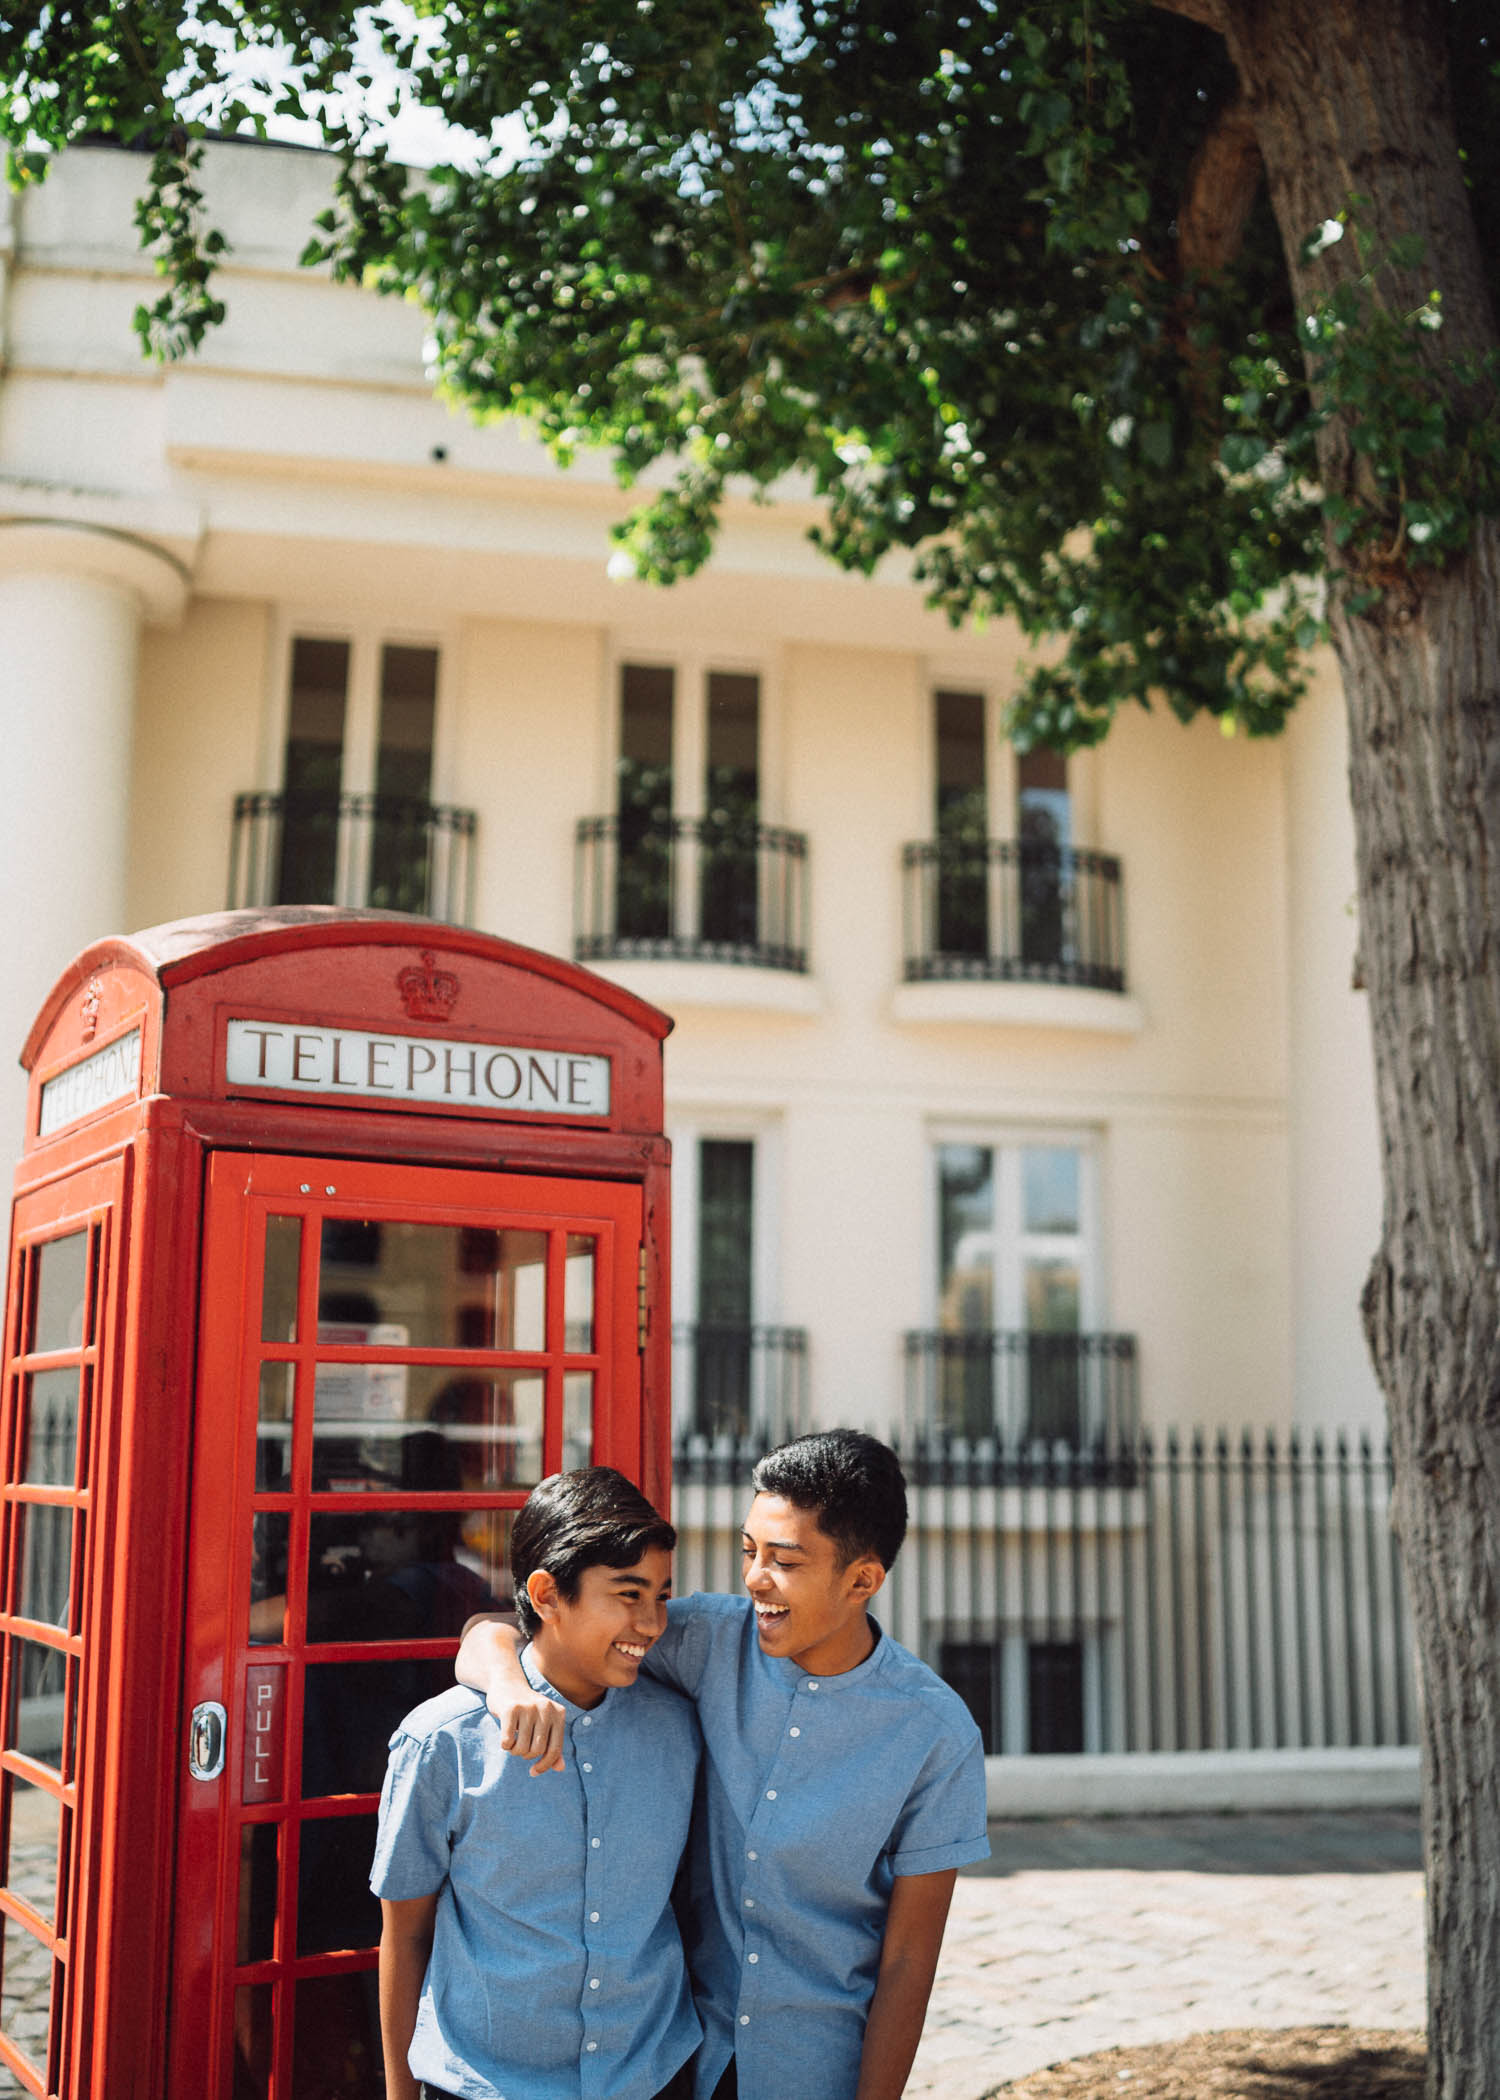 London Vacation Photography